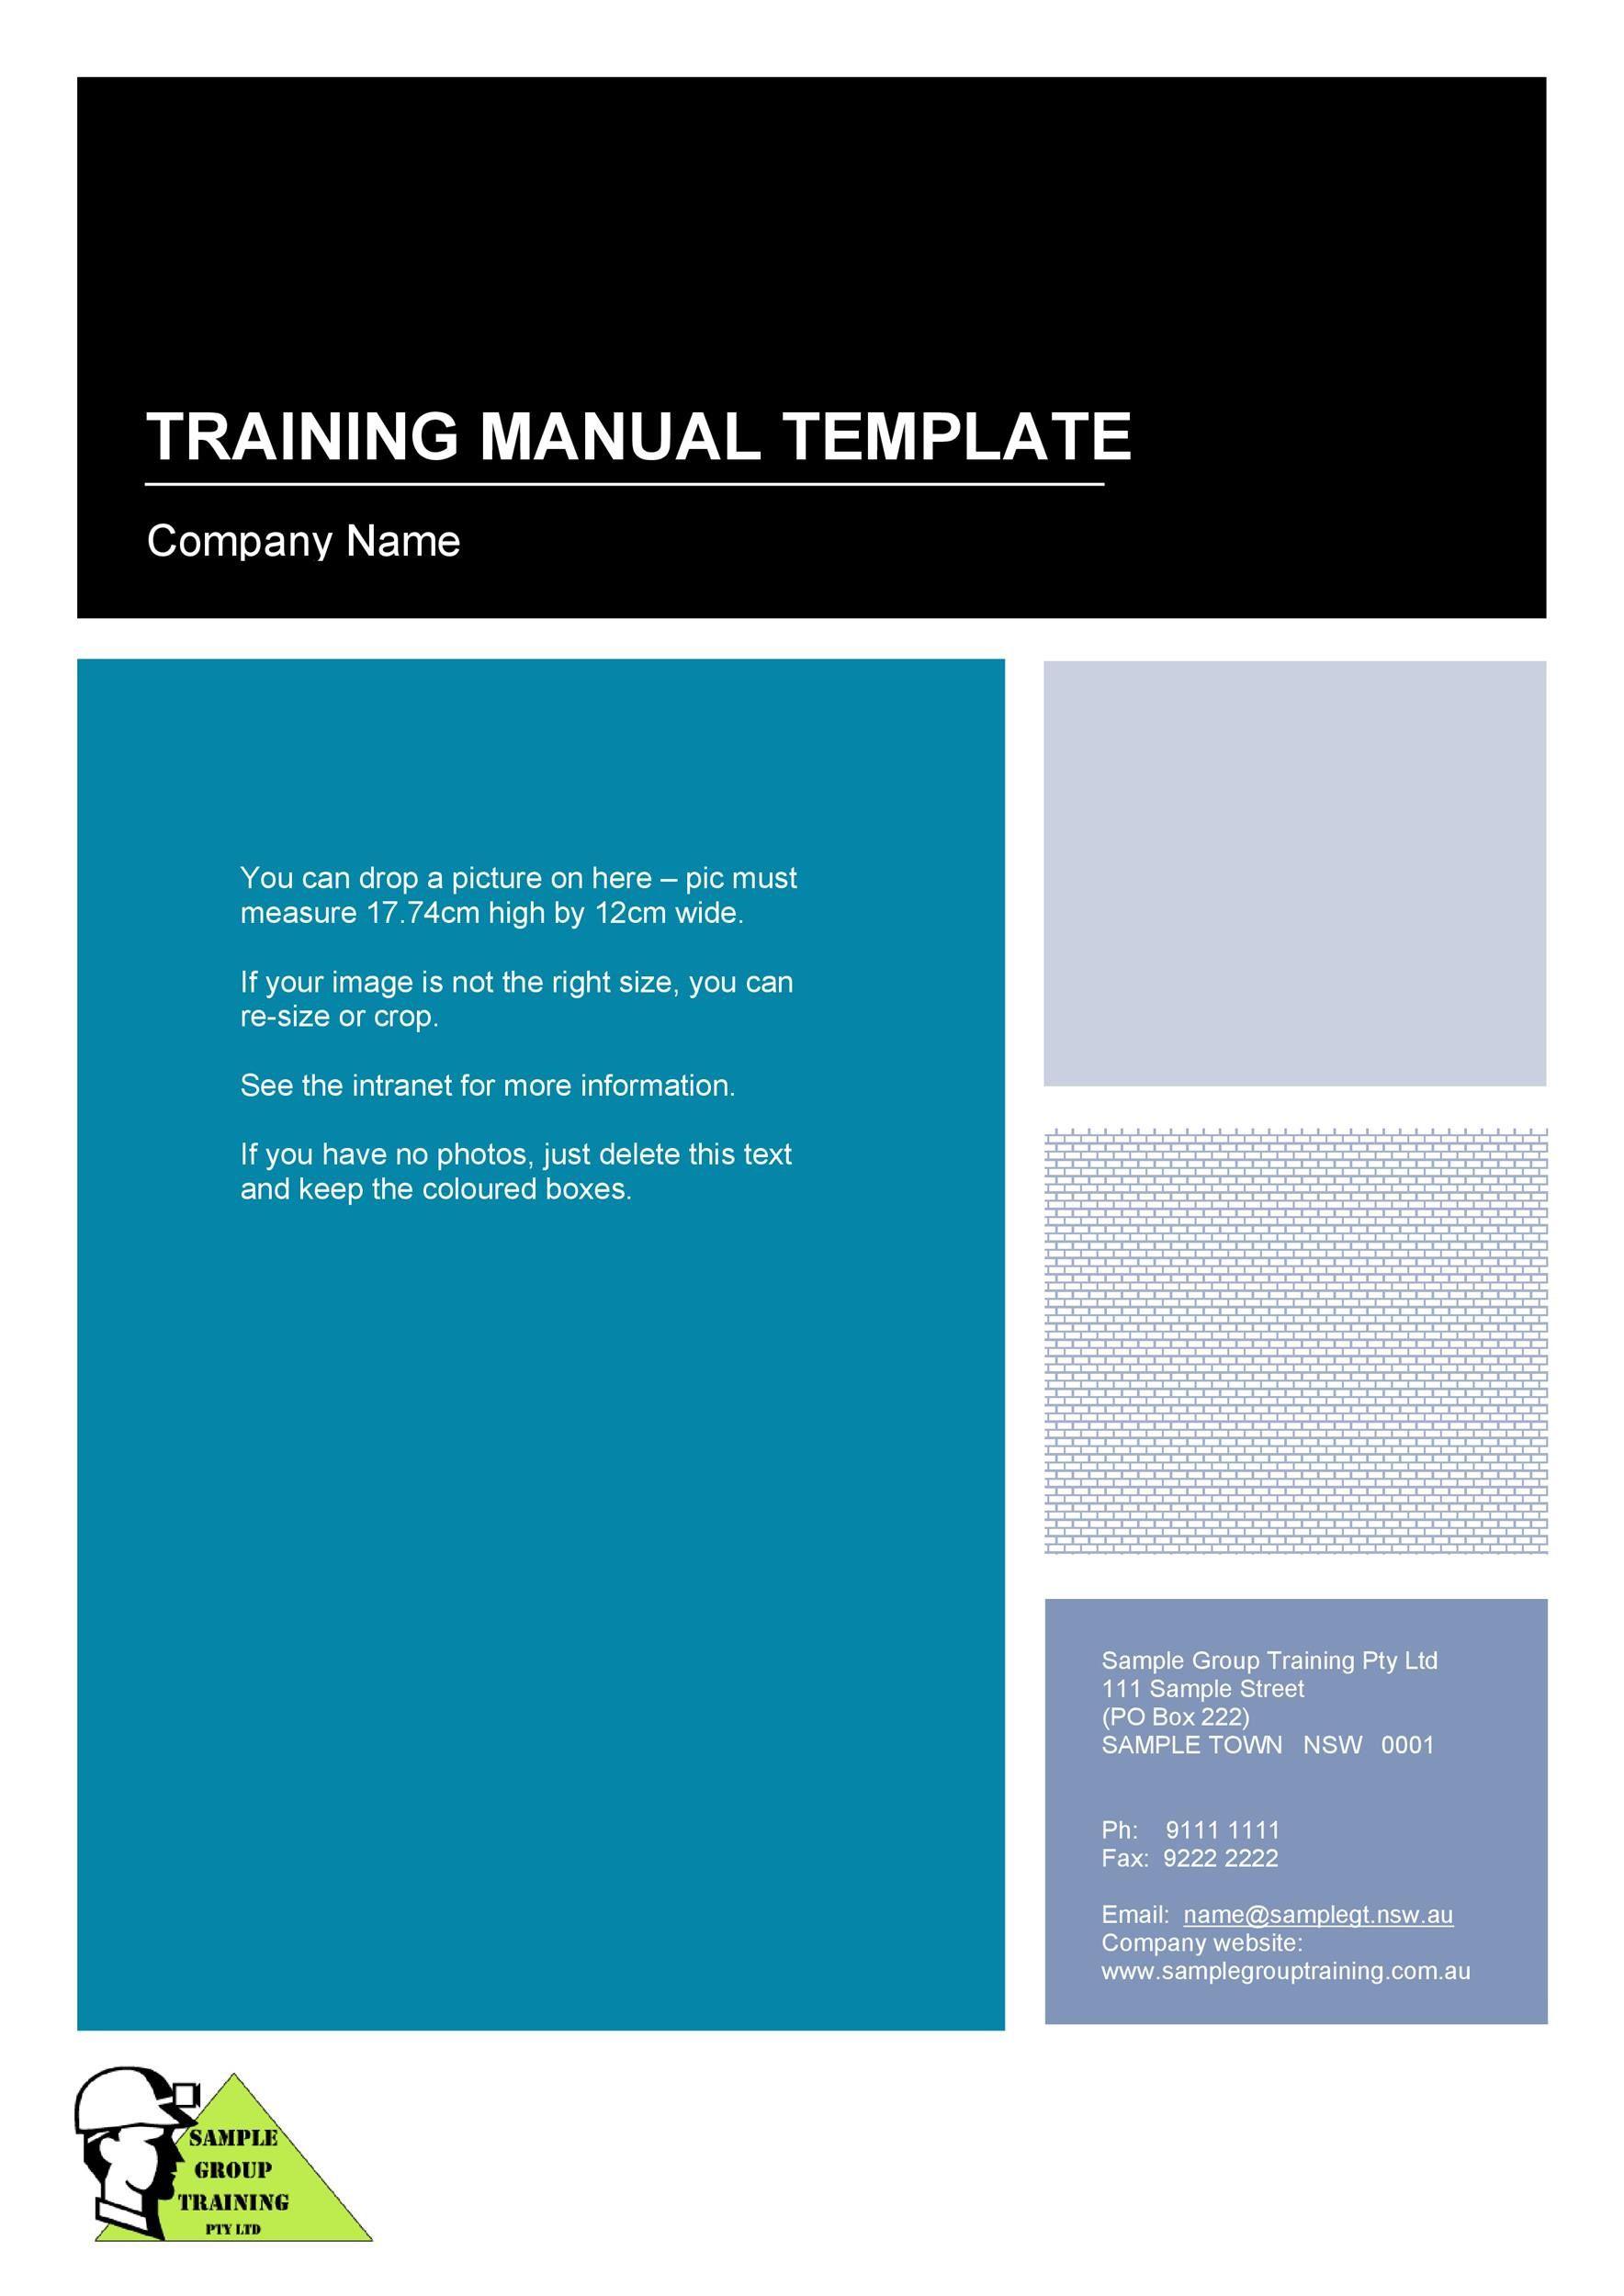 009 Excellent Free Employee Handbook Template Word High Def  Sample In Training ManualFull